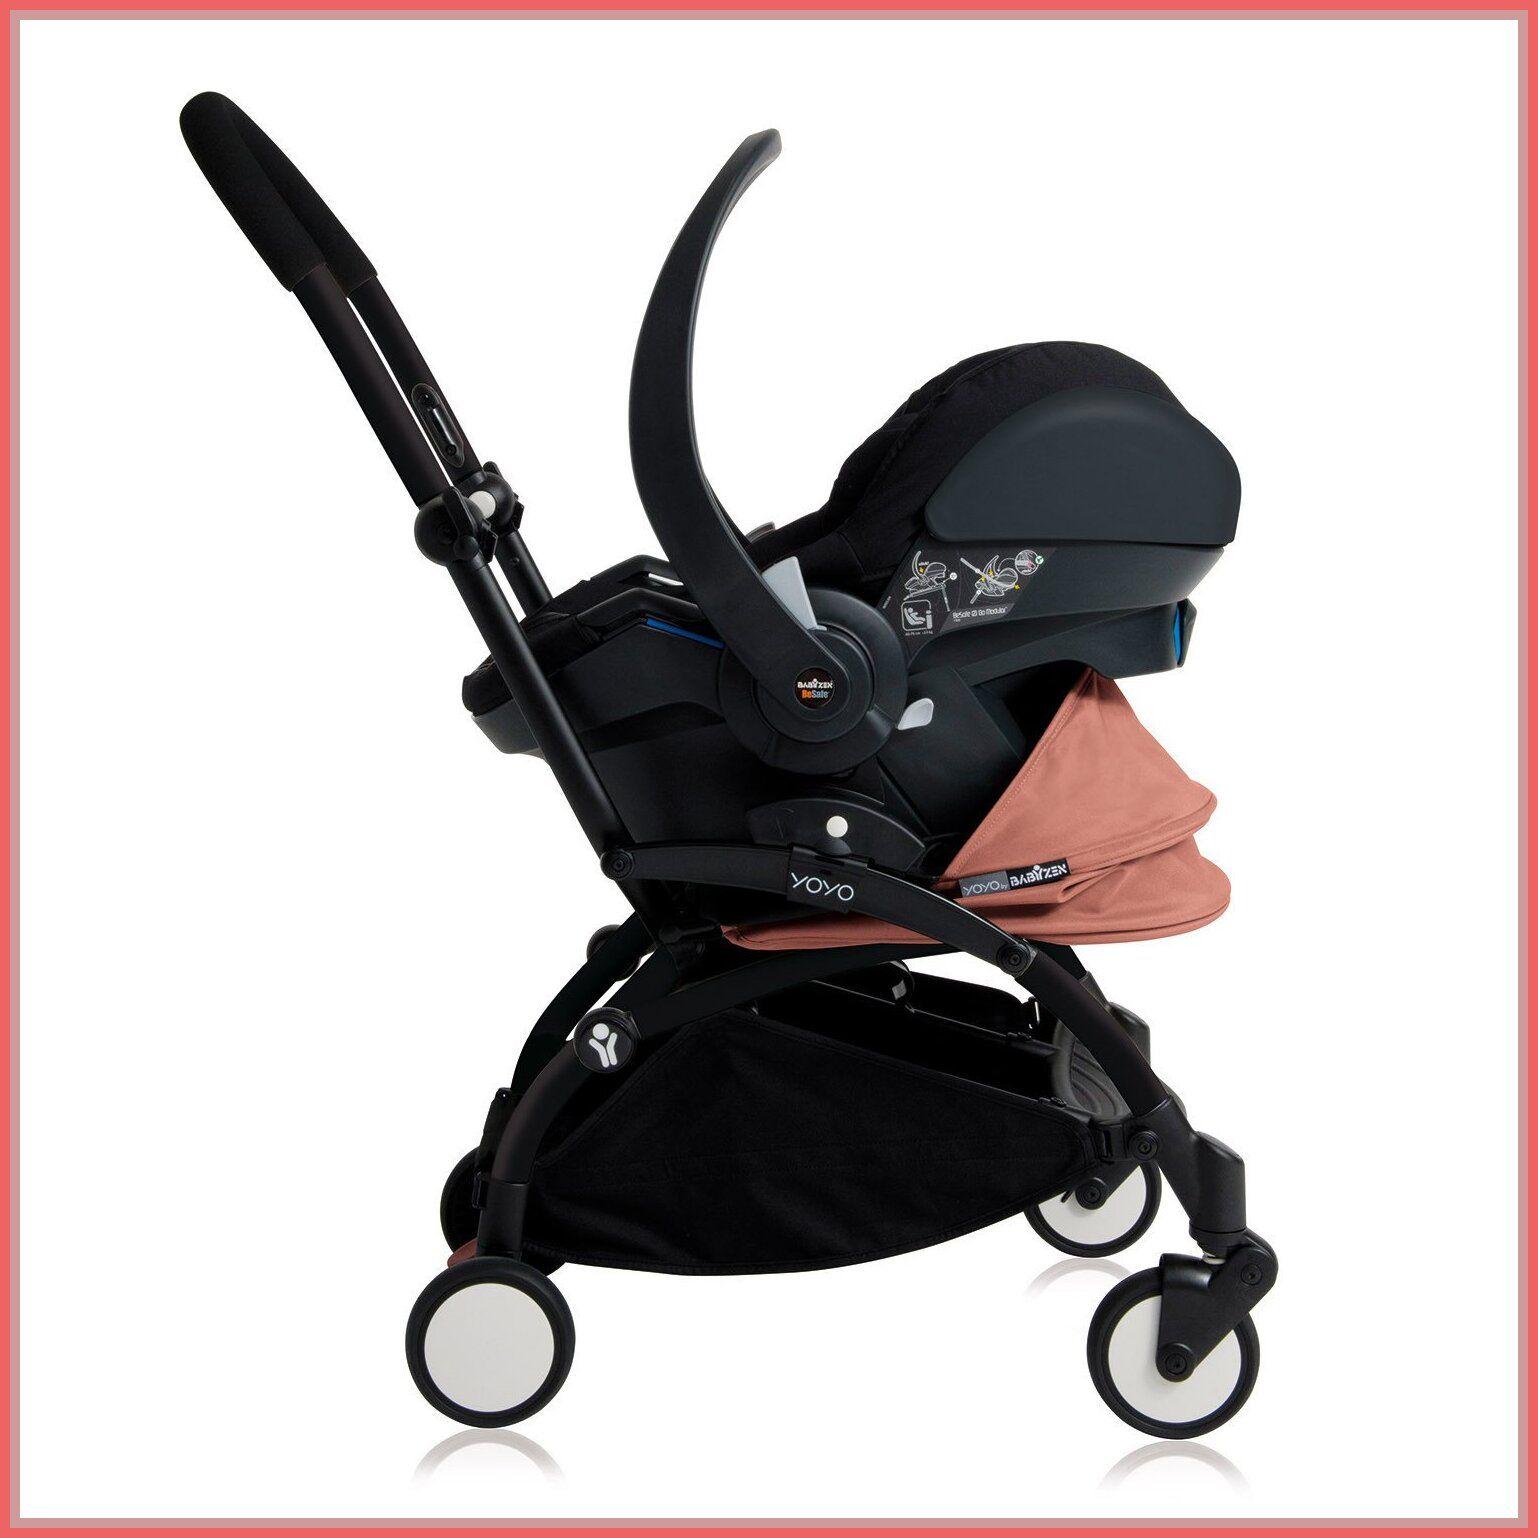 37+ Infant car seat stroller combo clearance ideas